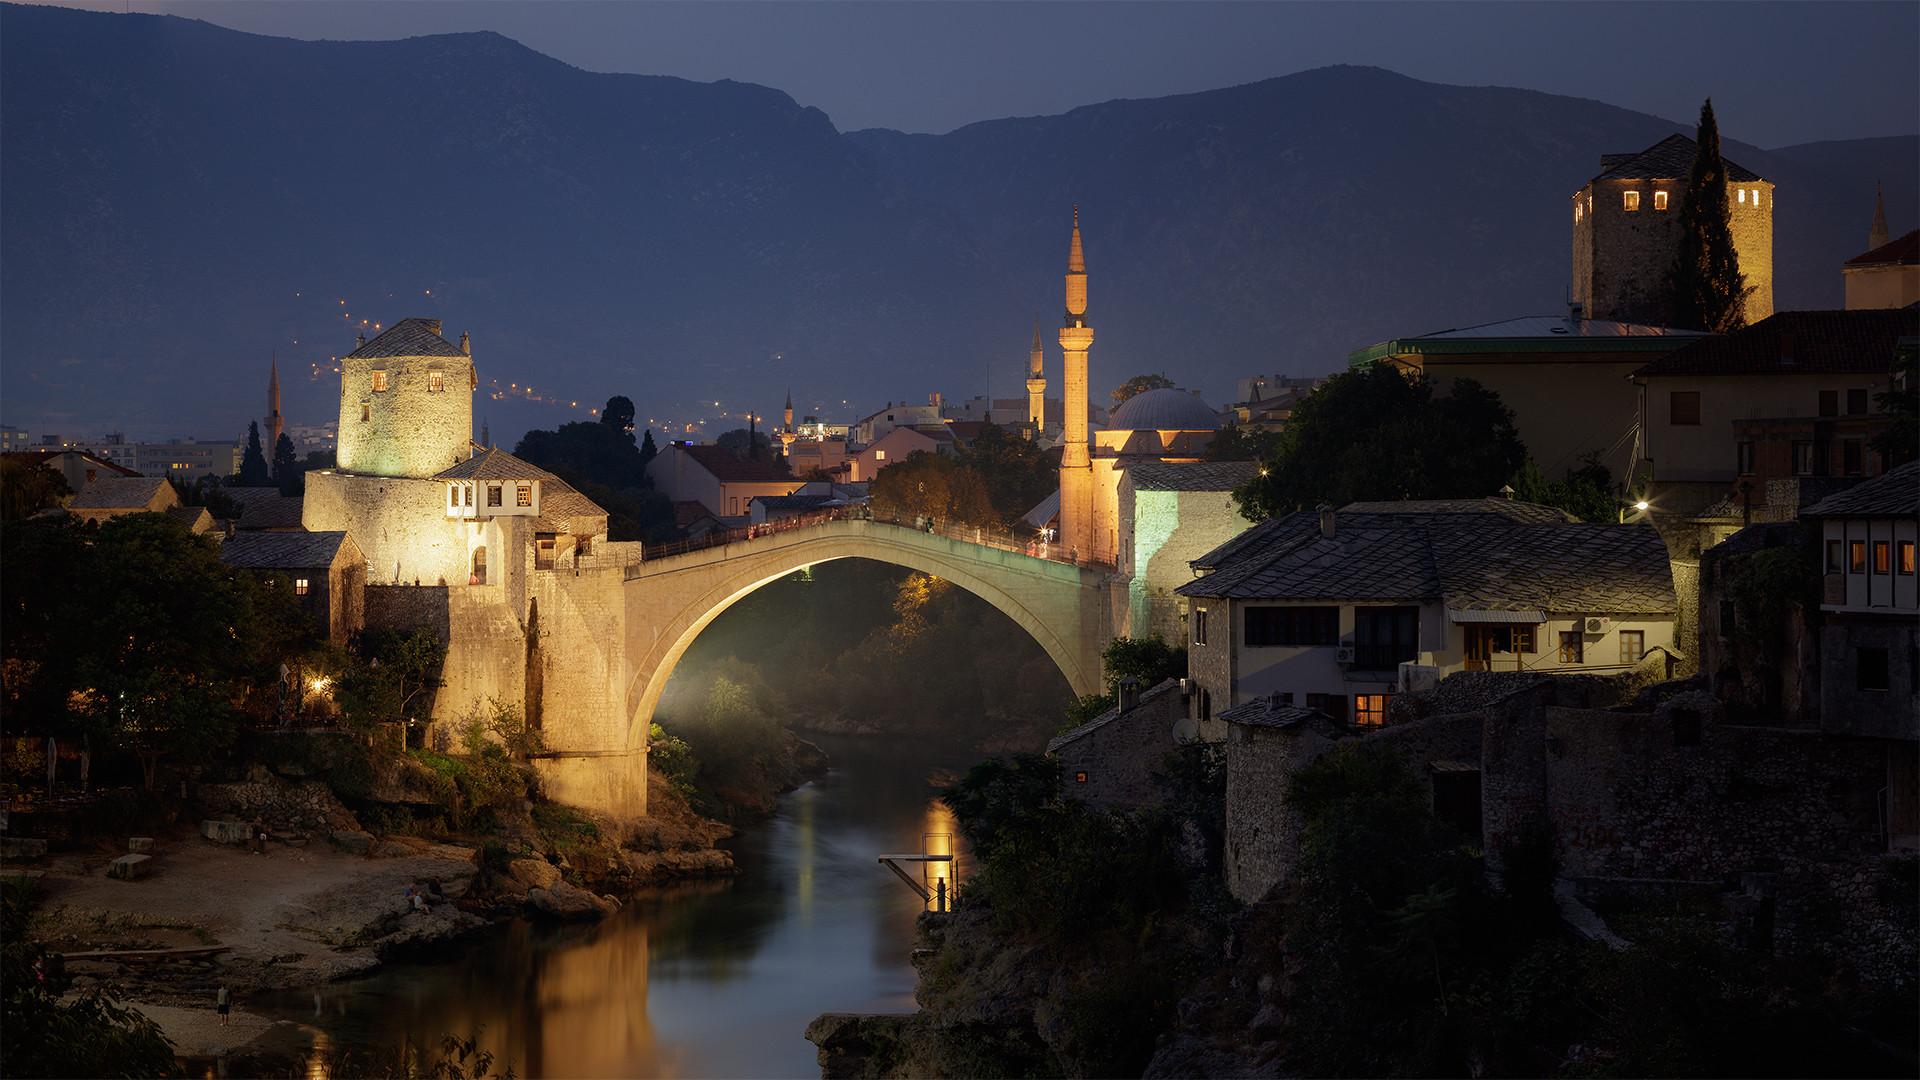 Evening in Mostar...